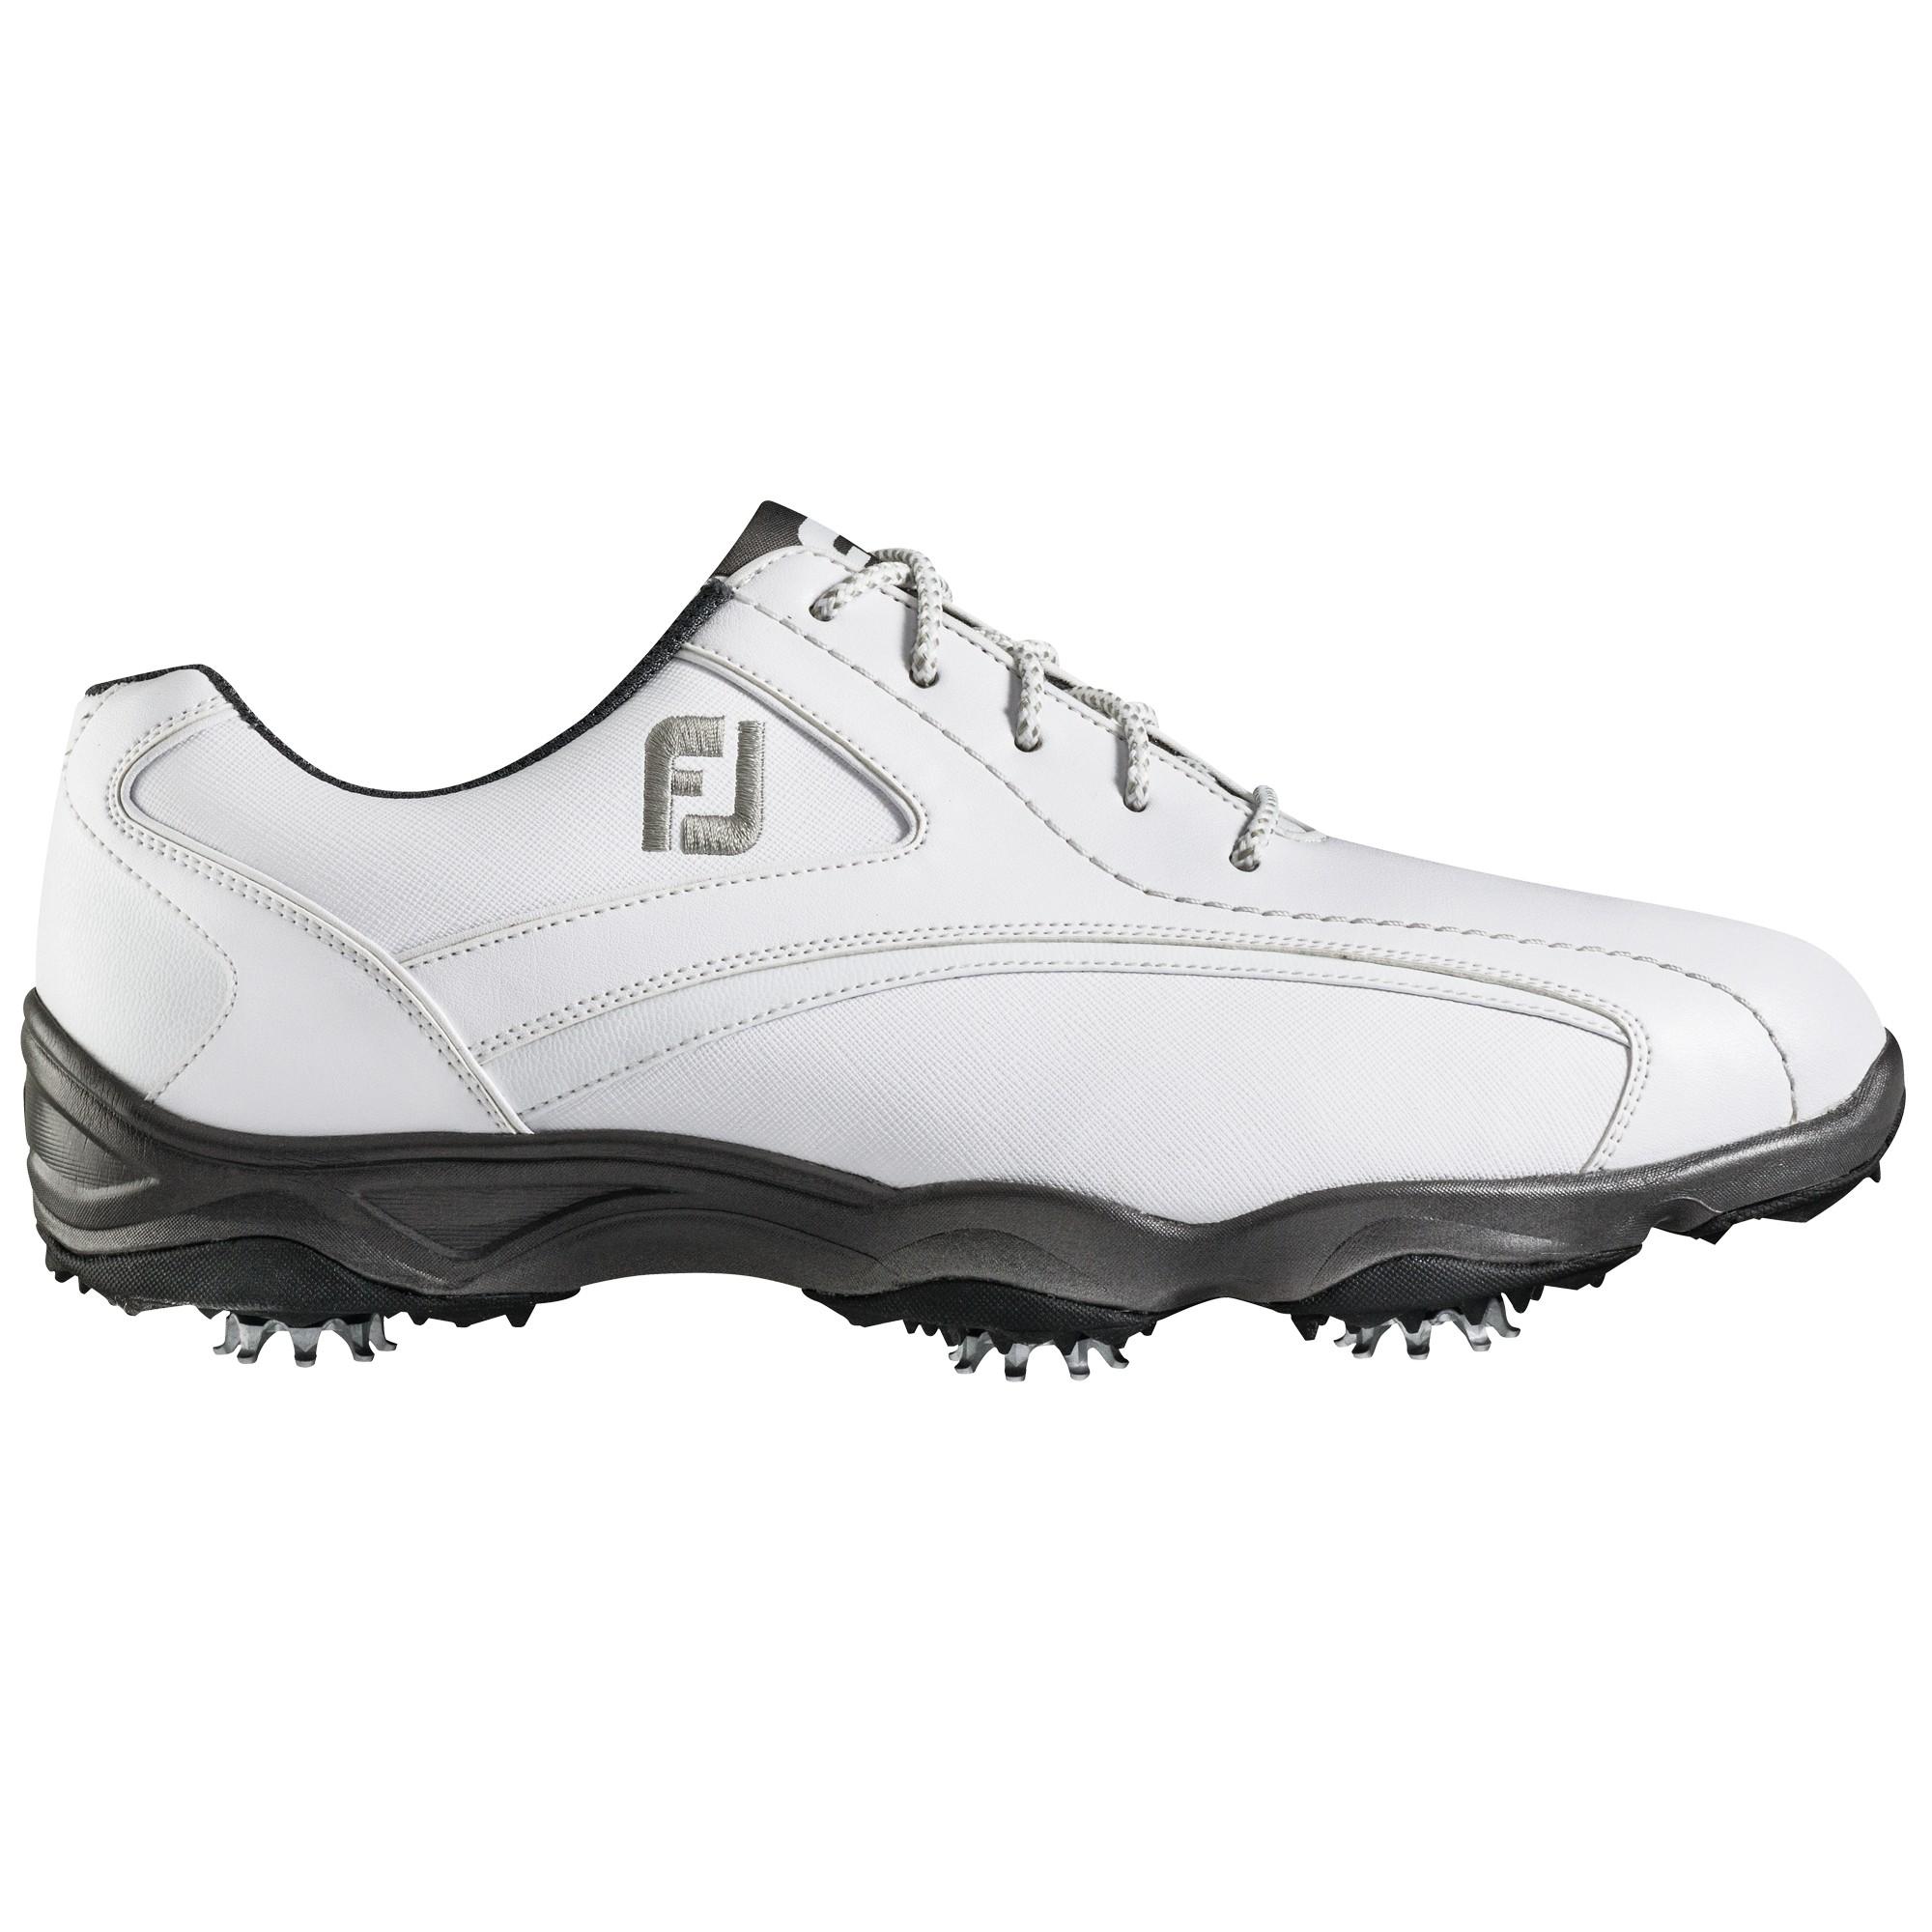 Footjoy Superlites Spikeless Golf Shoes Mens